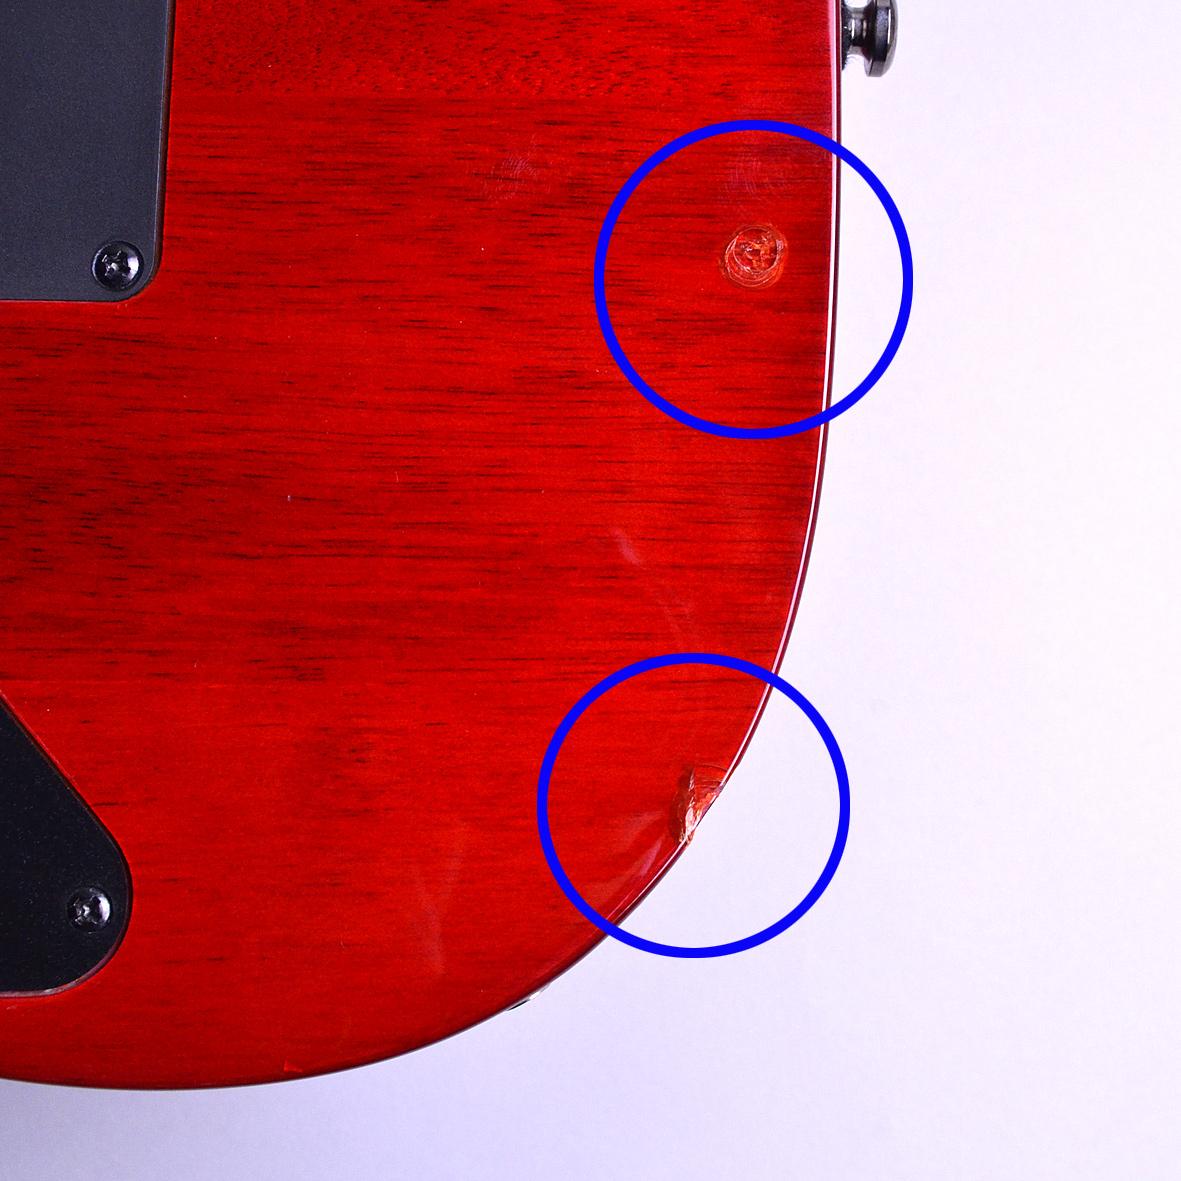 RG370FMZ  Transparent Red Burstの指板画像